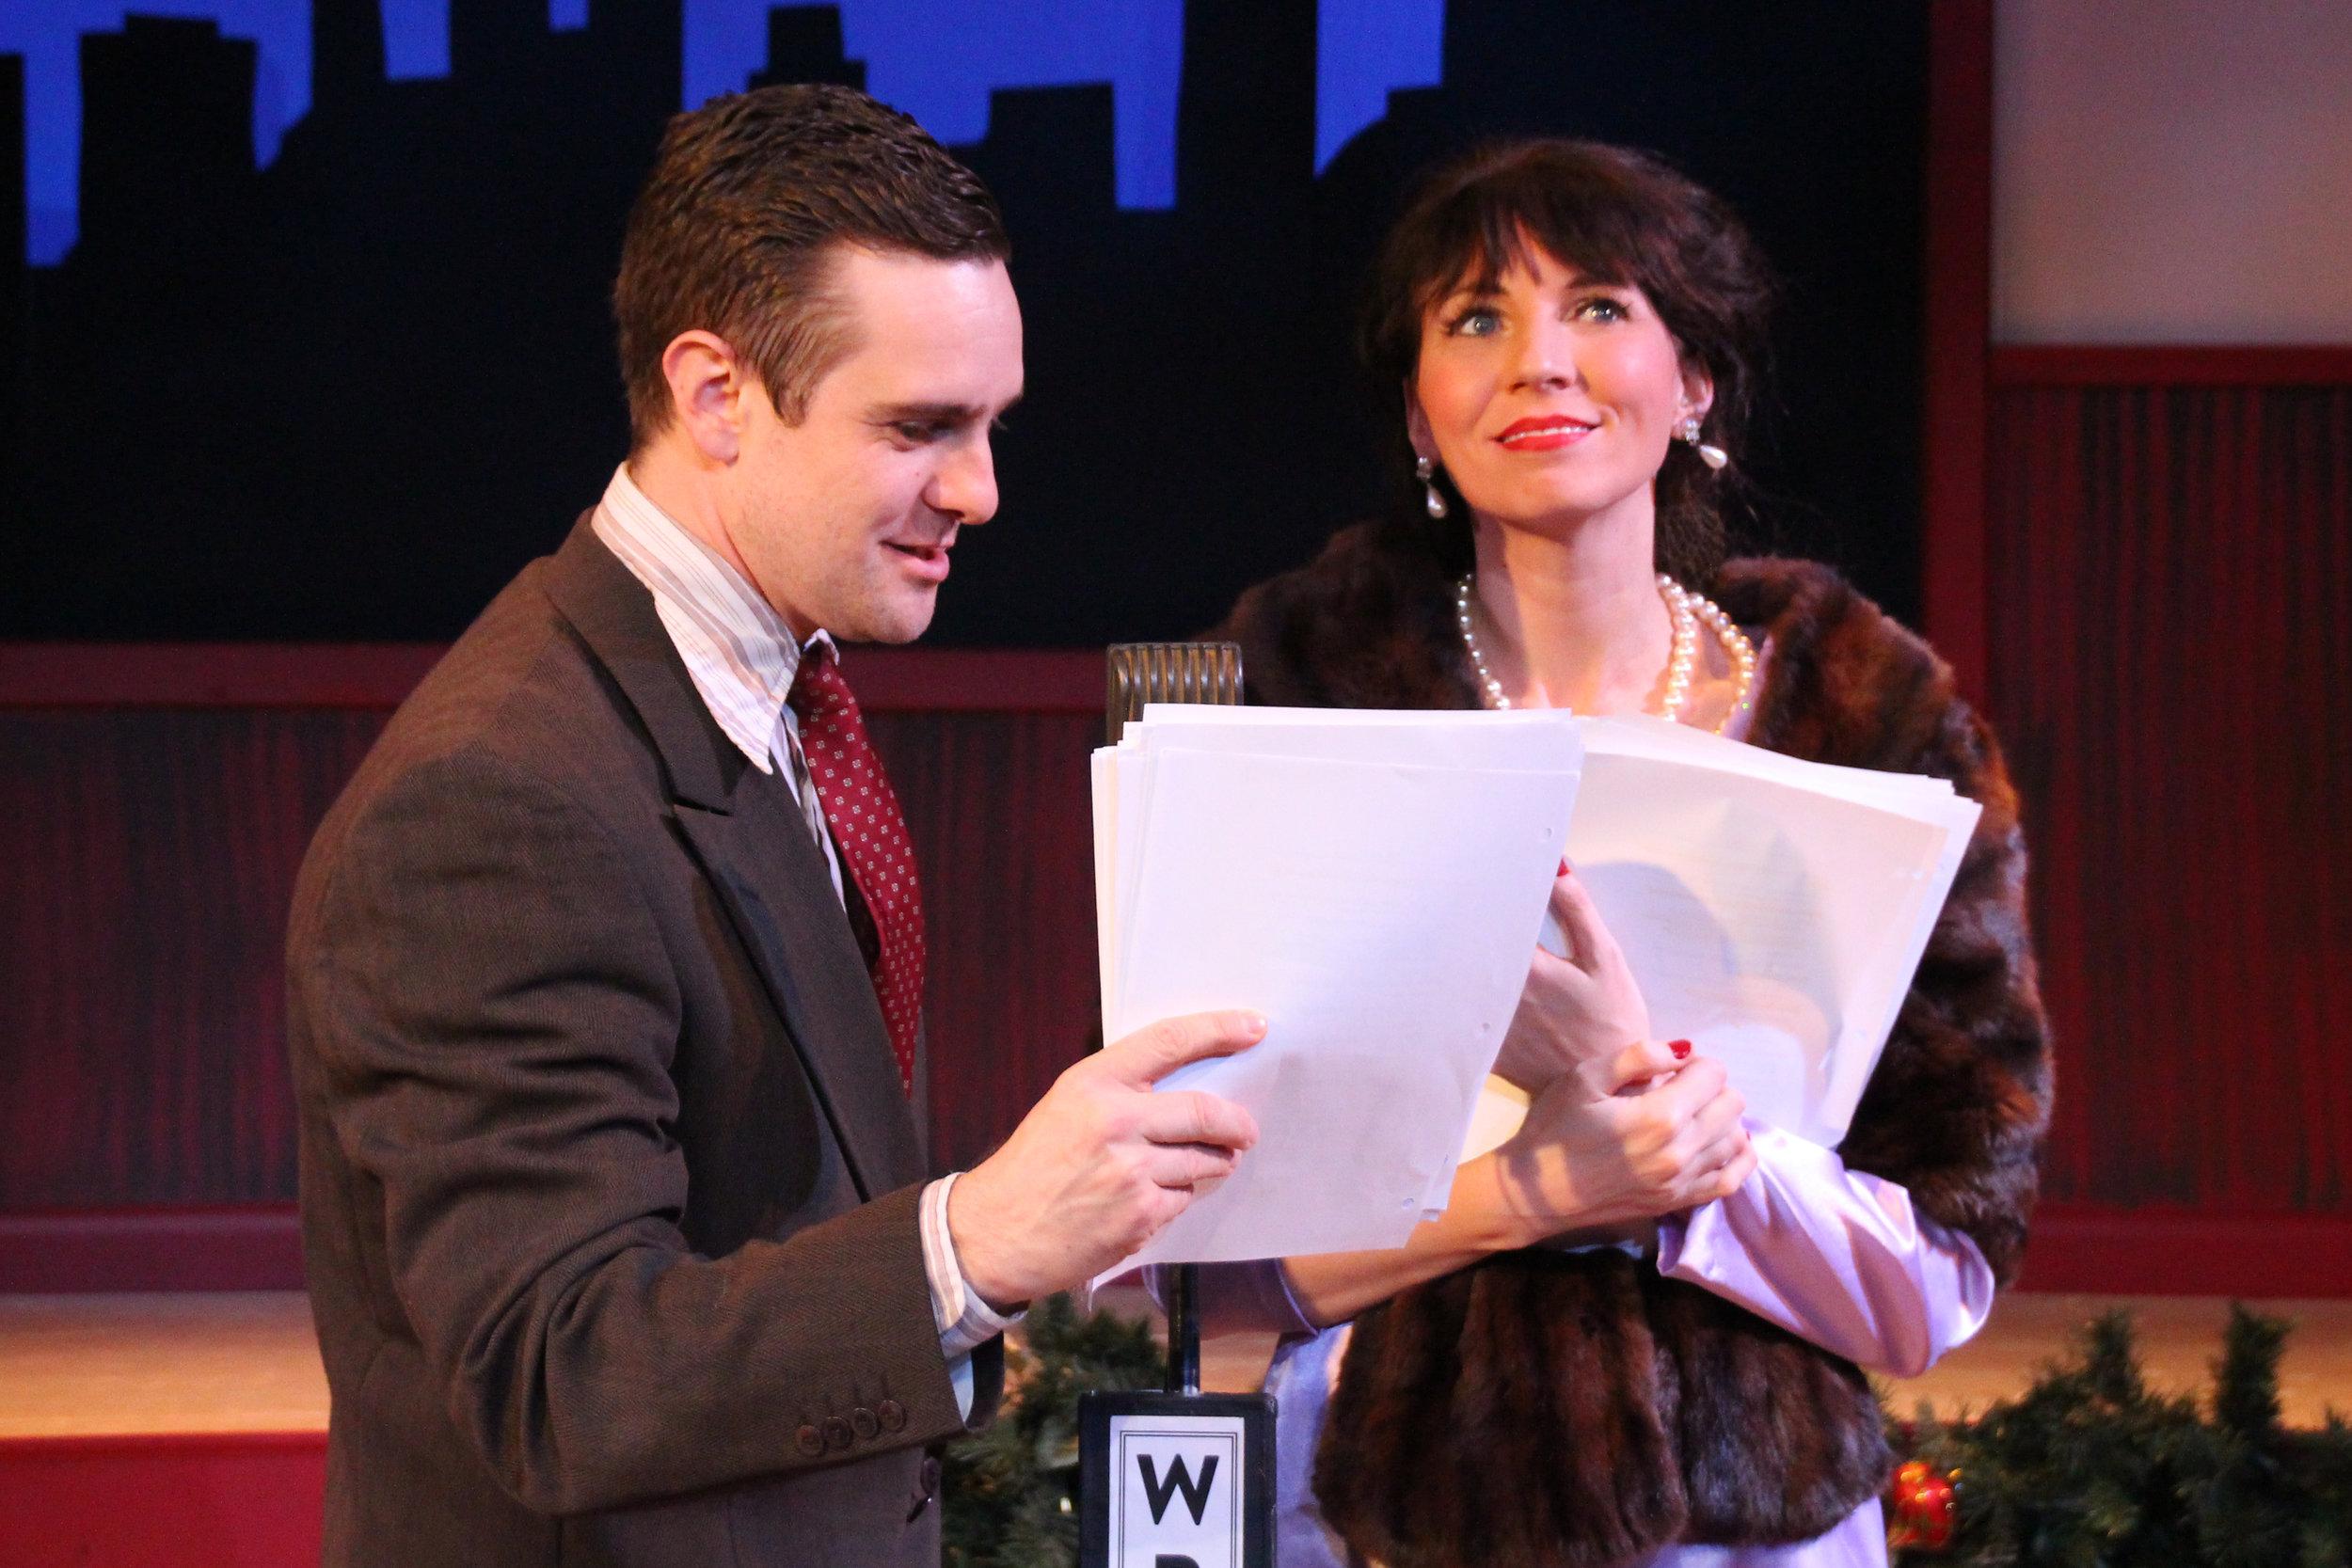 Jon-Michael Miller and Elizabeth Donnelly